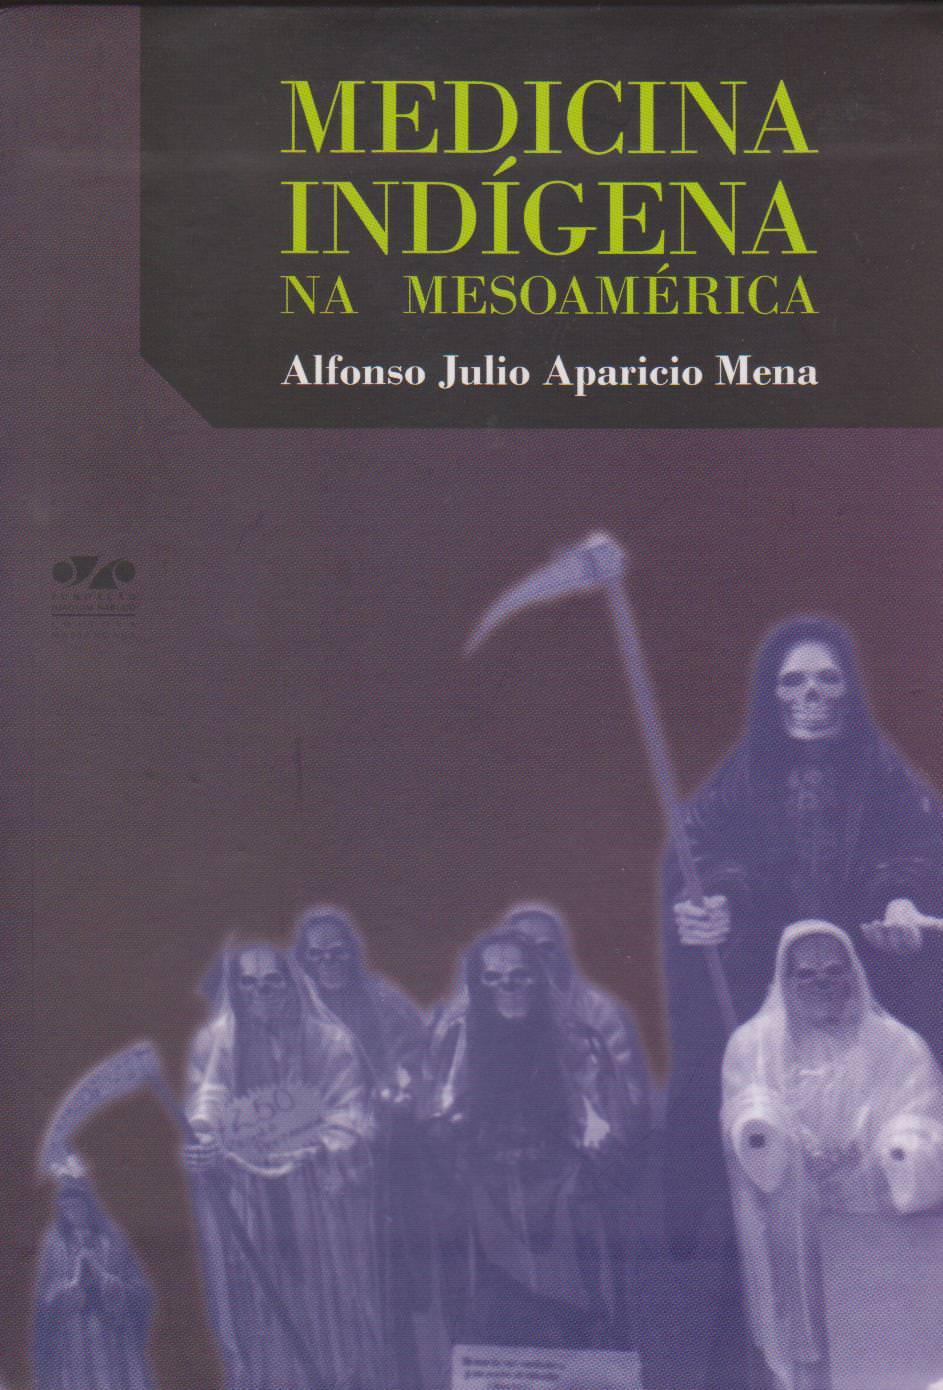 Medicina indígena na Mesoamérica, livro de Alfonso Julio Aparicio Mena